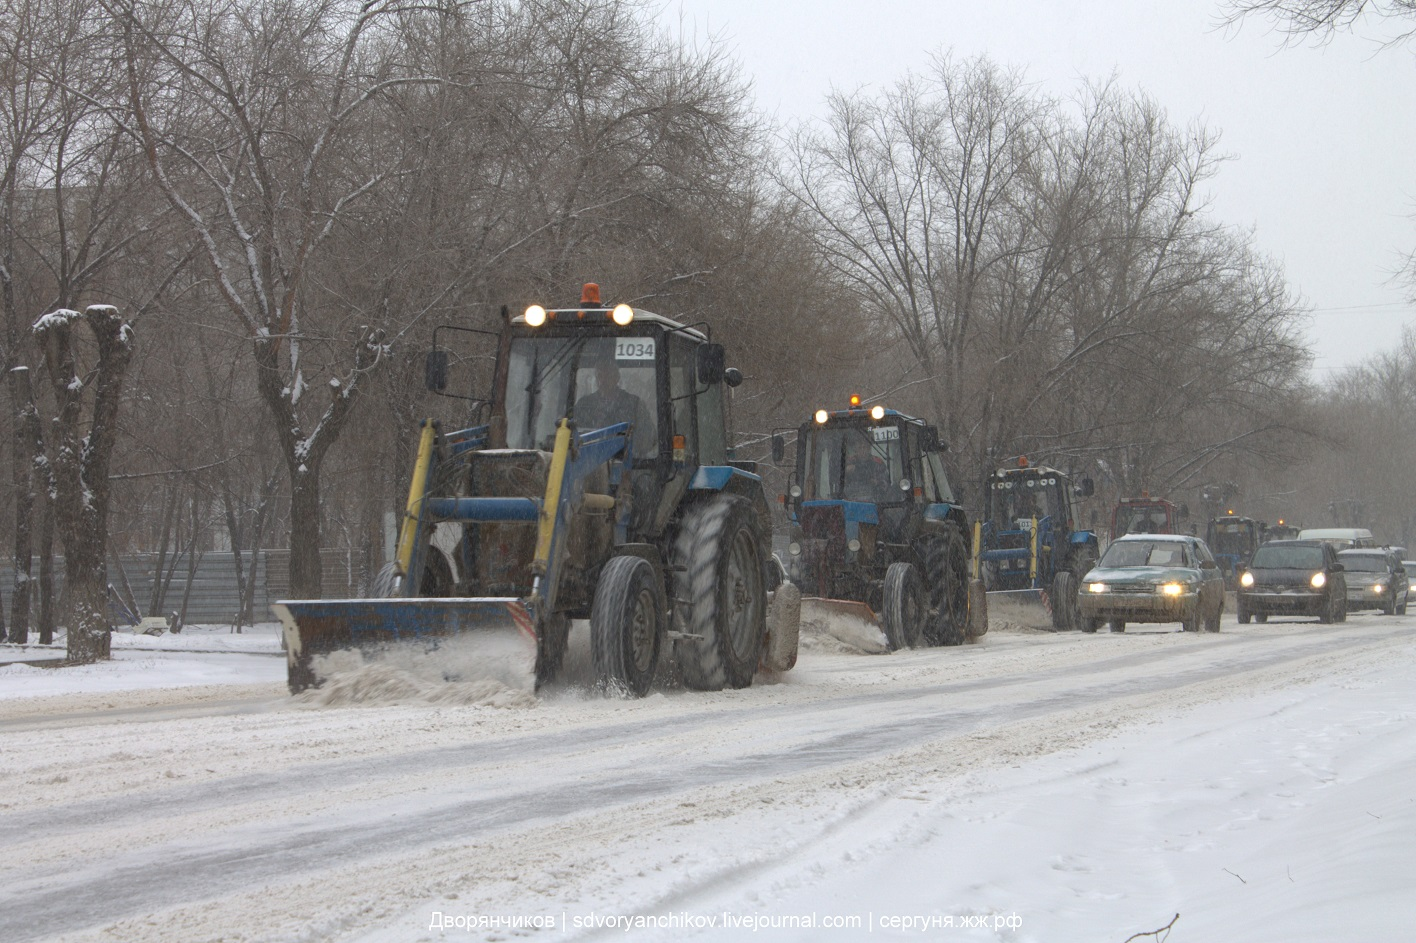 Волжский - трактора чистят дороги от снега